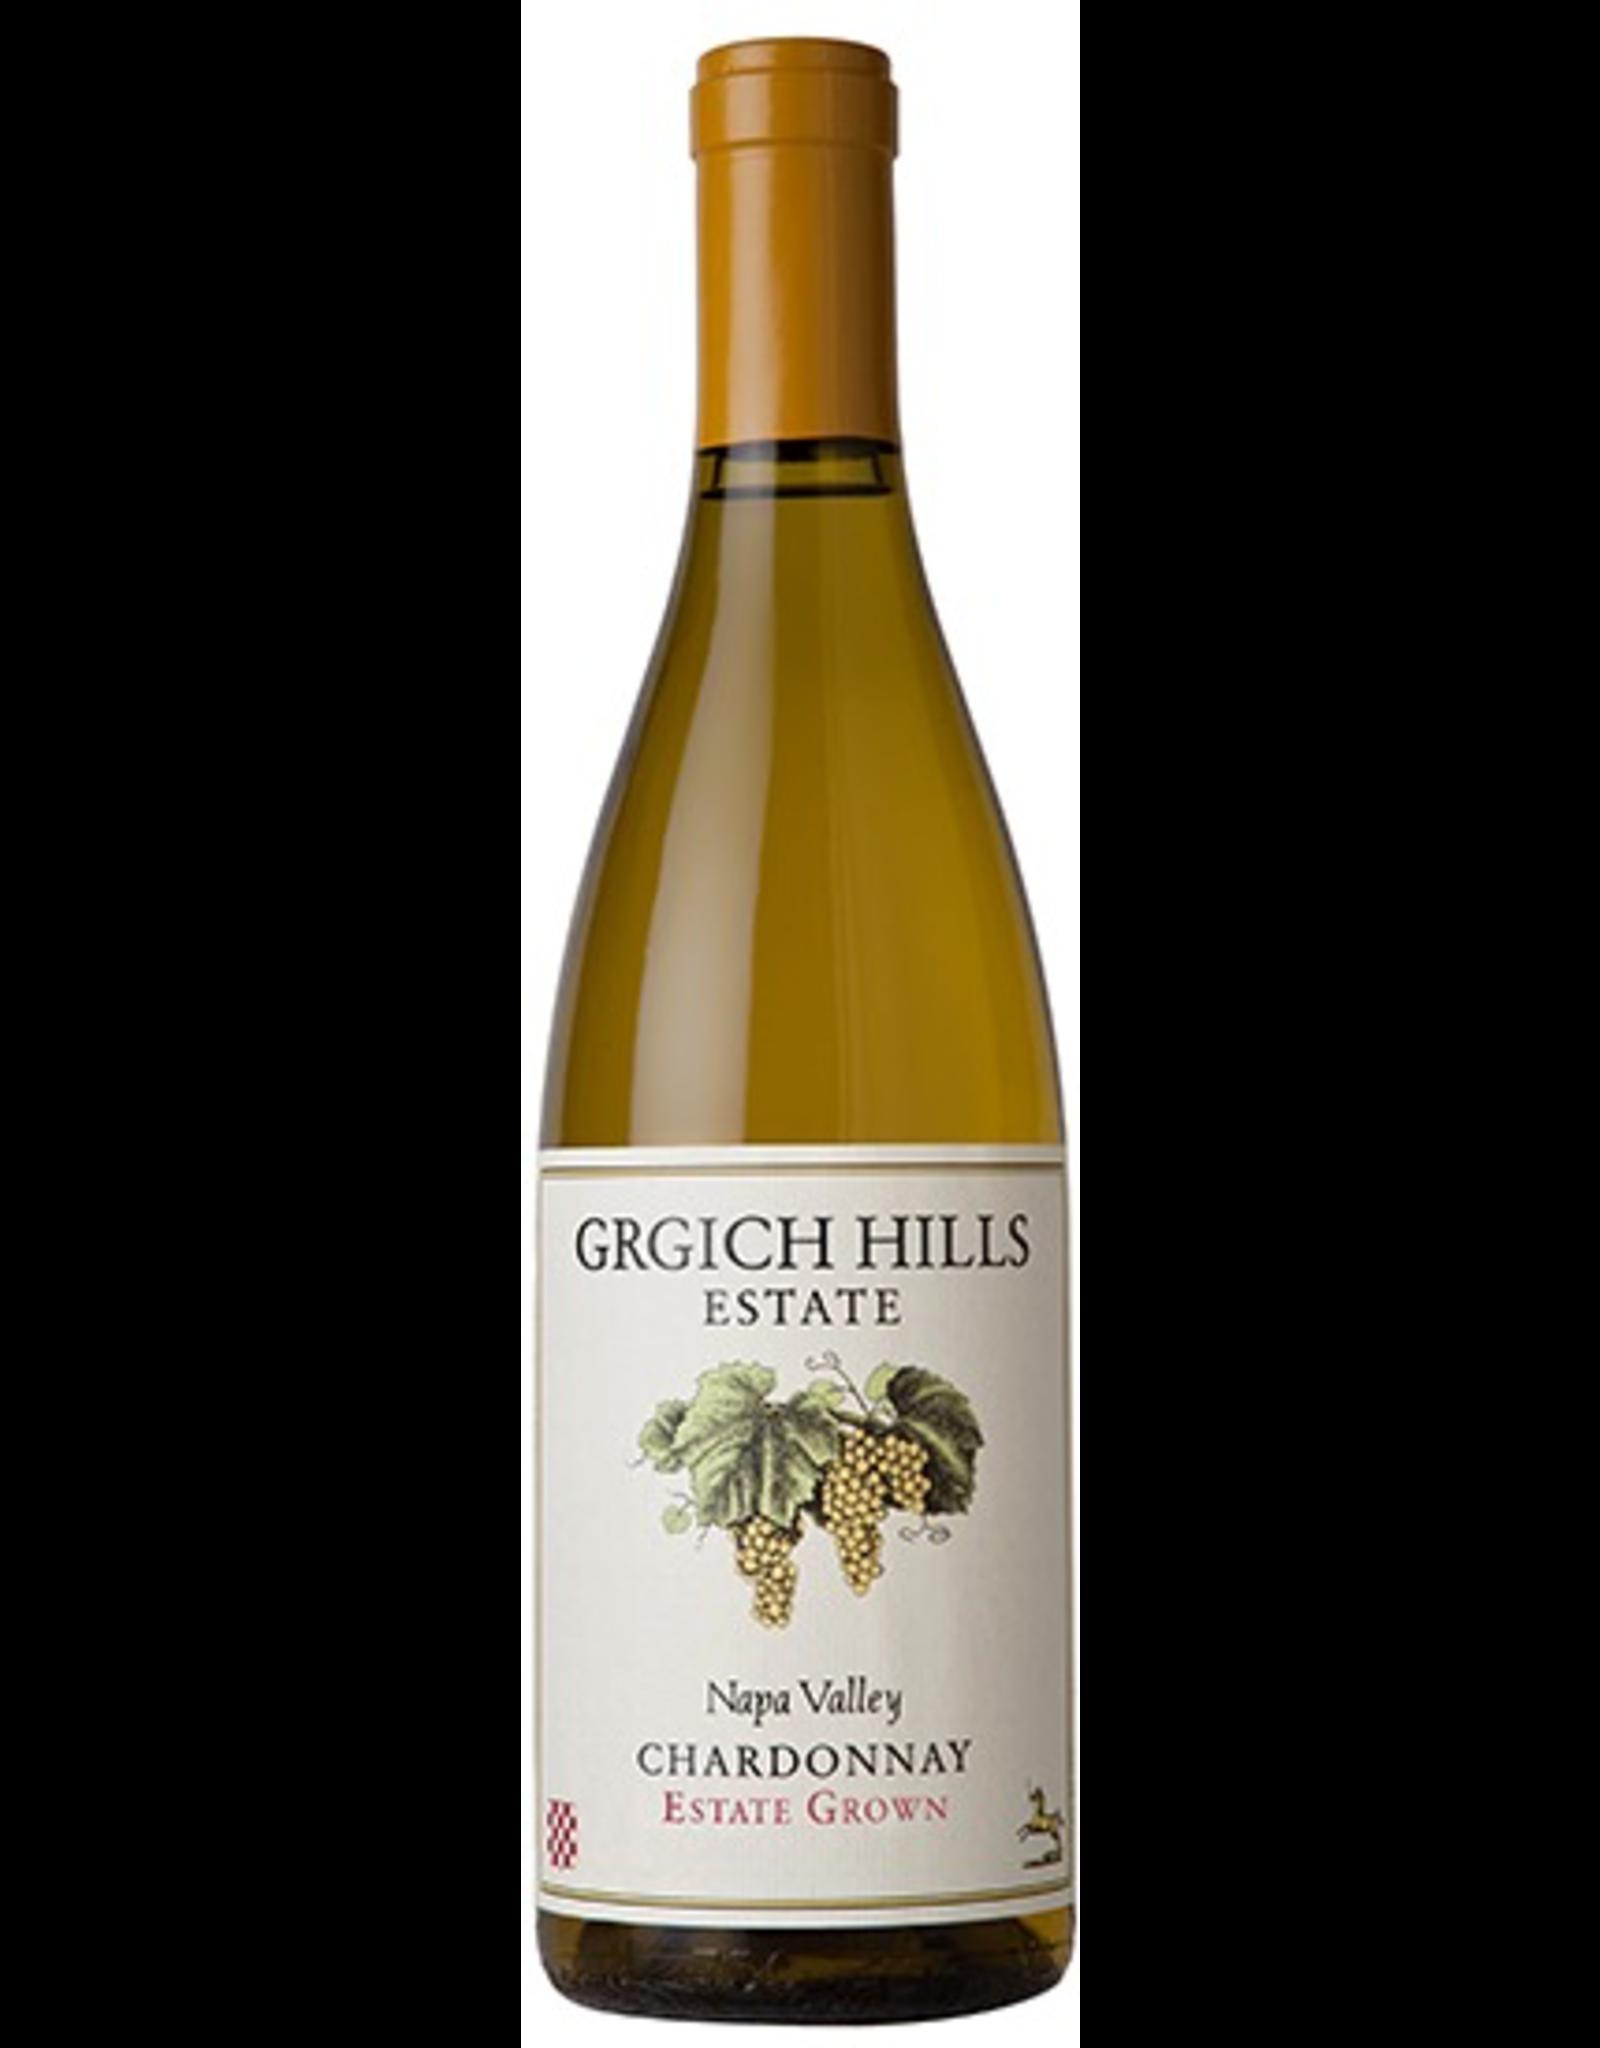 White Wine NV, Grgich Hills Estate, Chardonnay, Napa Valley, Napa, California, 13.55 Alc, CTnr, TW93